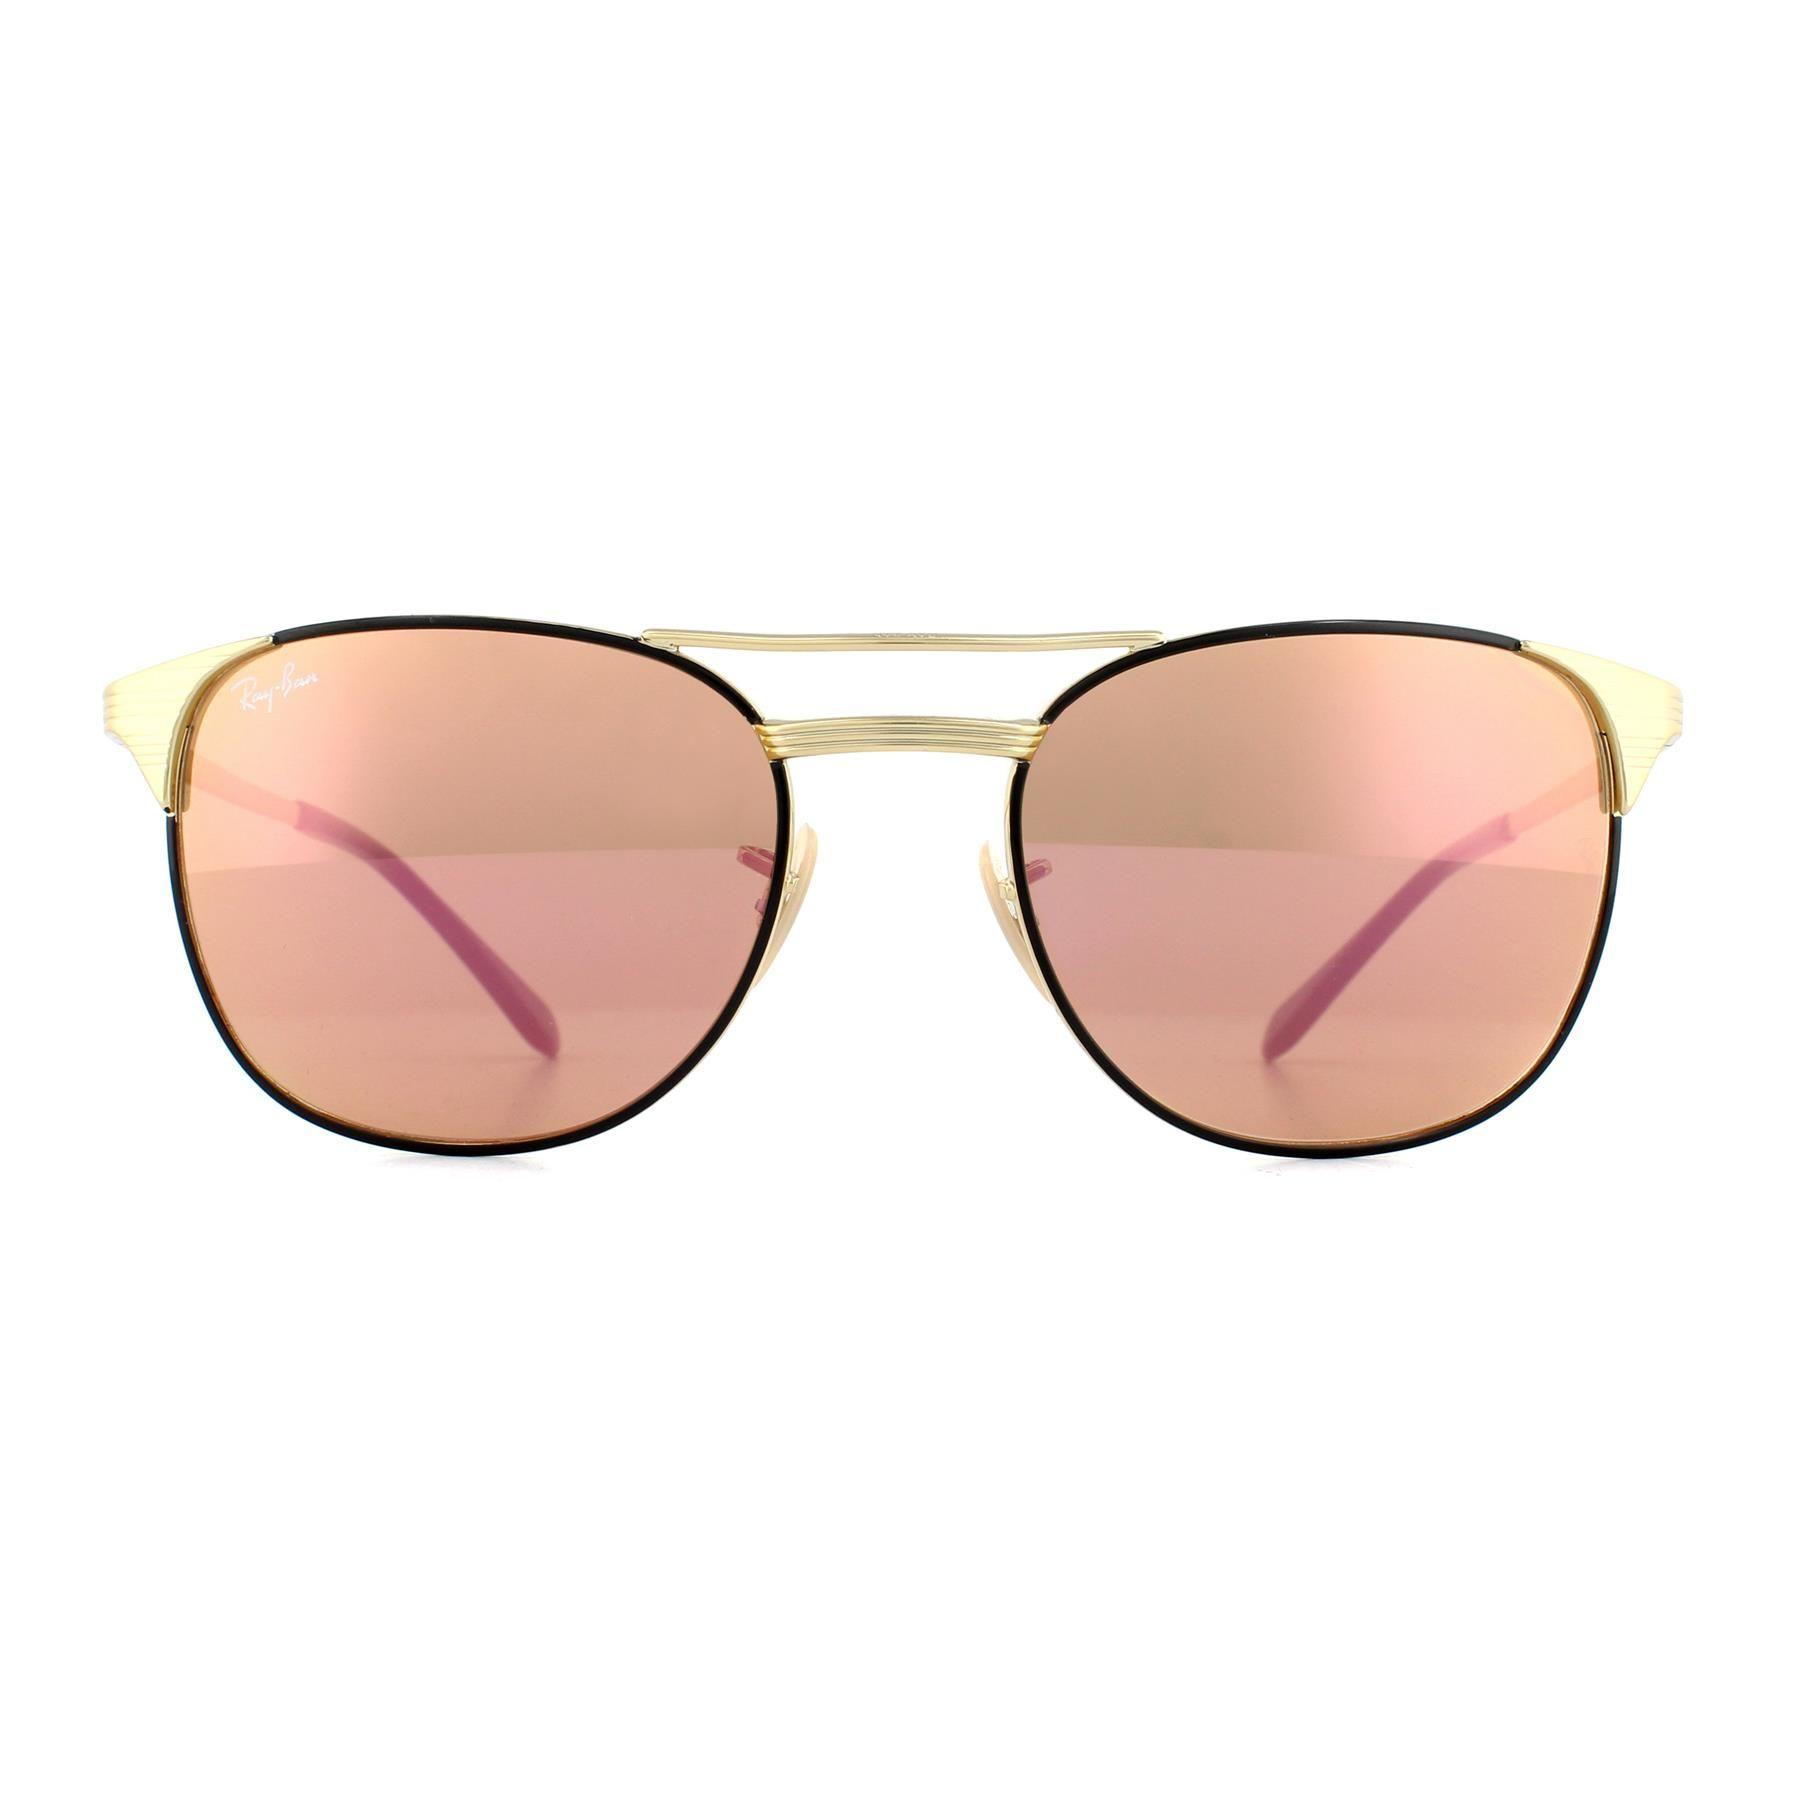 Ray-Ban Sunglasses Signet 3429M 9000Z2 Black Gold Copper Mirror 55mm